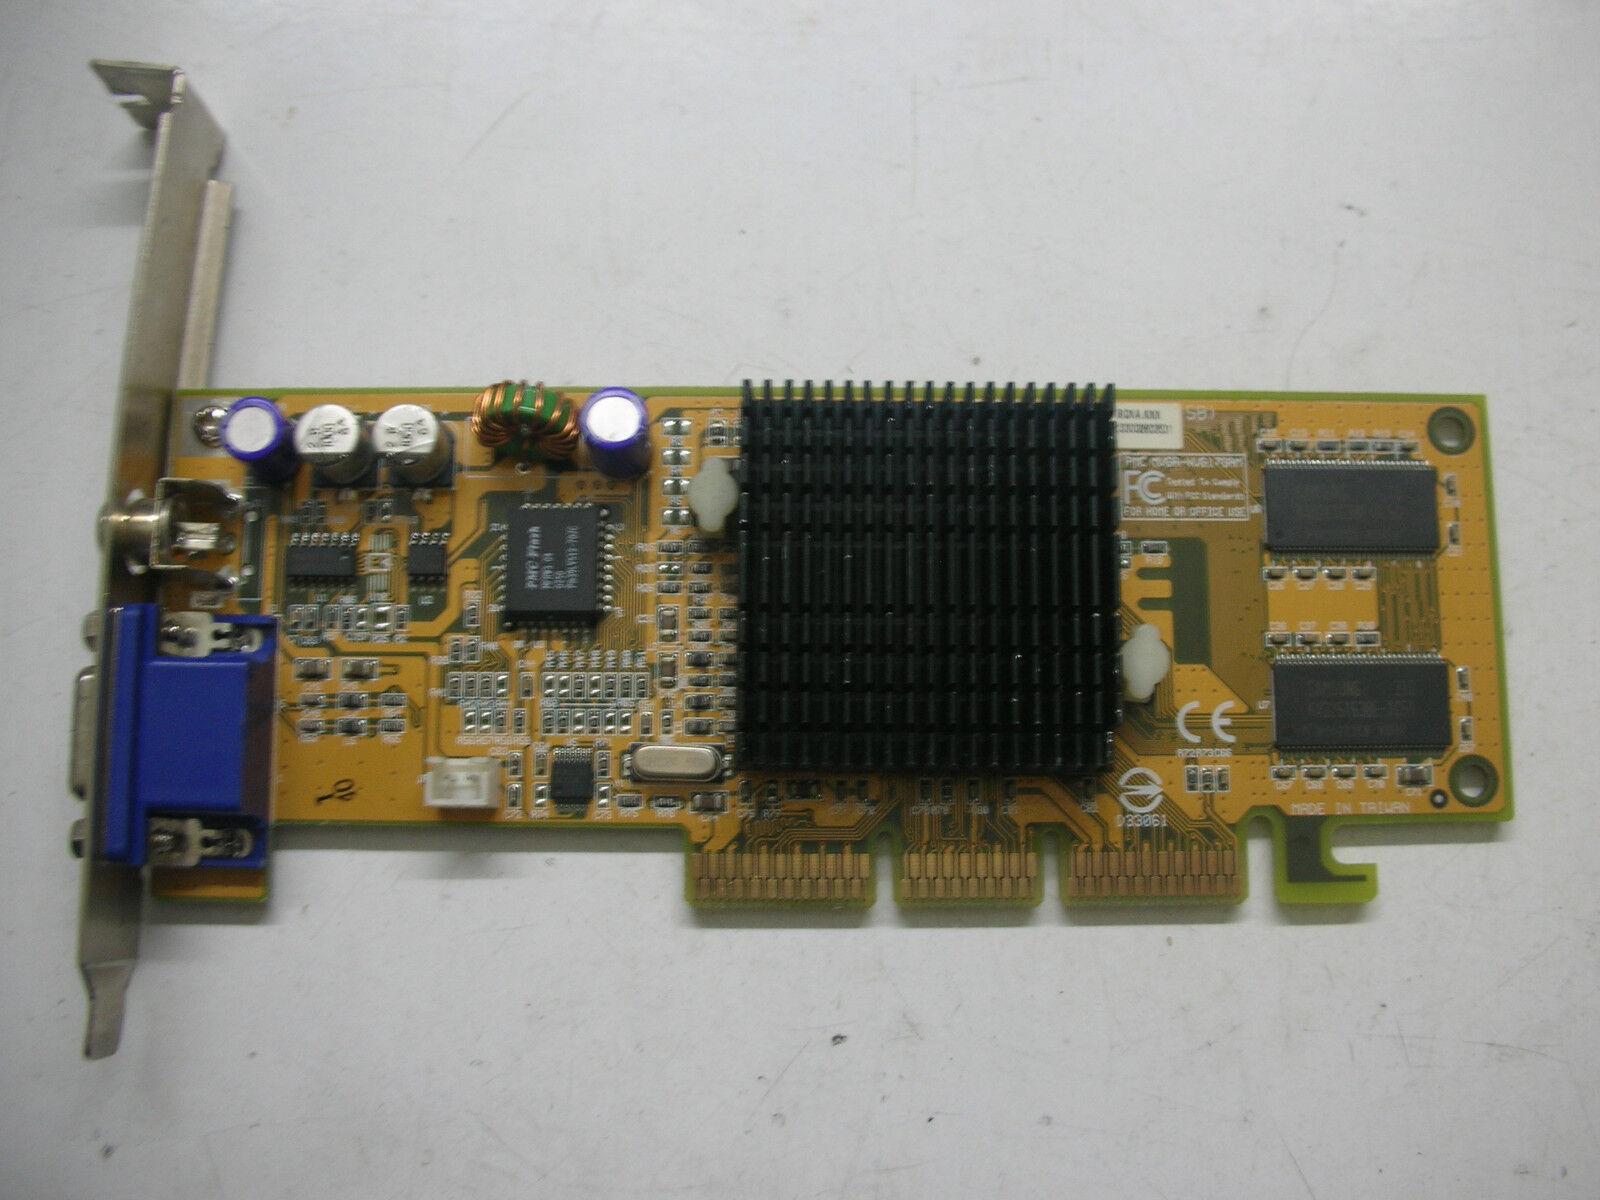 Prolink Geforce 4 MX420 VGA TV Out MVGA-nvg17gam 64mb AGP